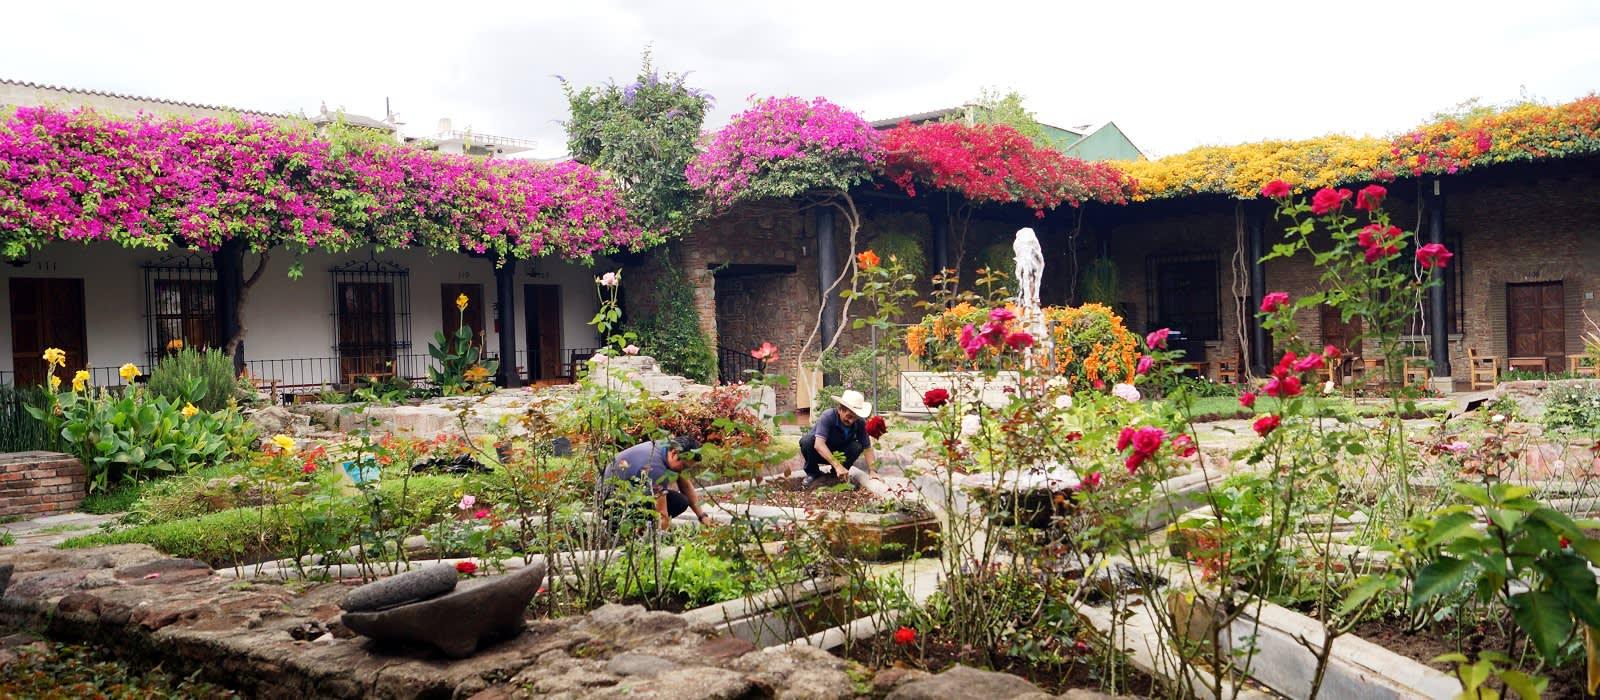 Guatemala – Atitlan-See und Antigua Urlaub 1